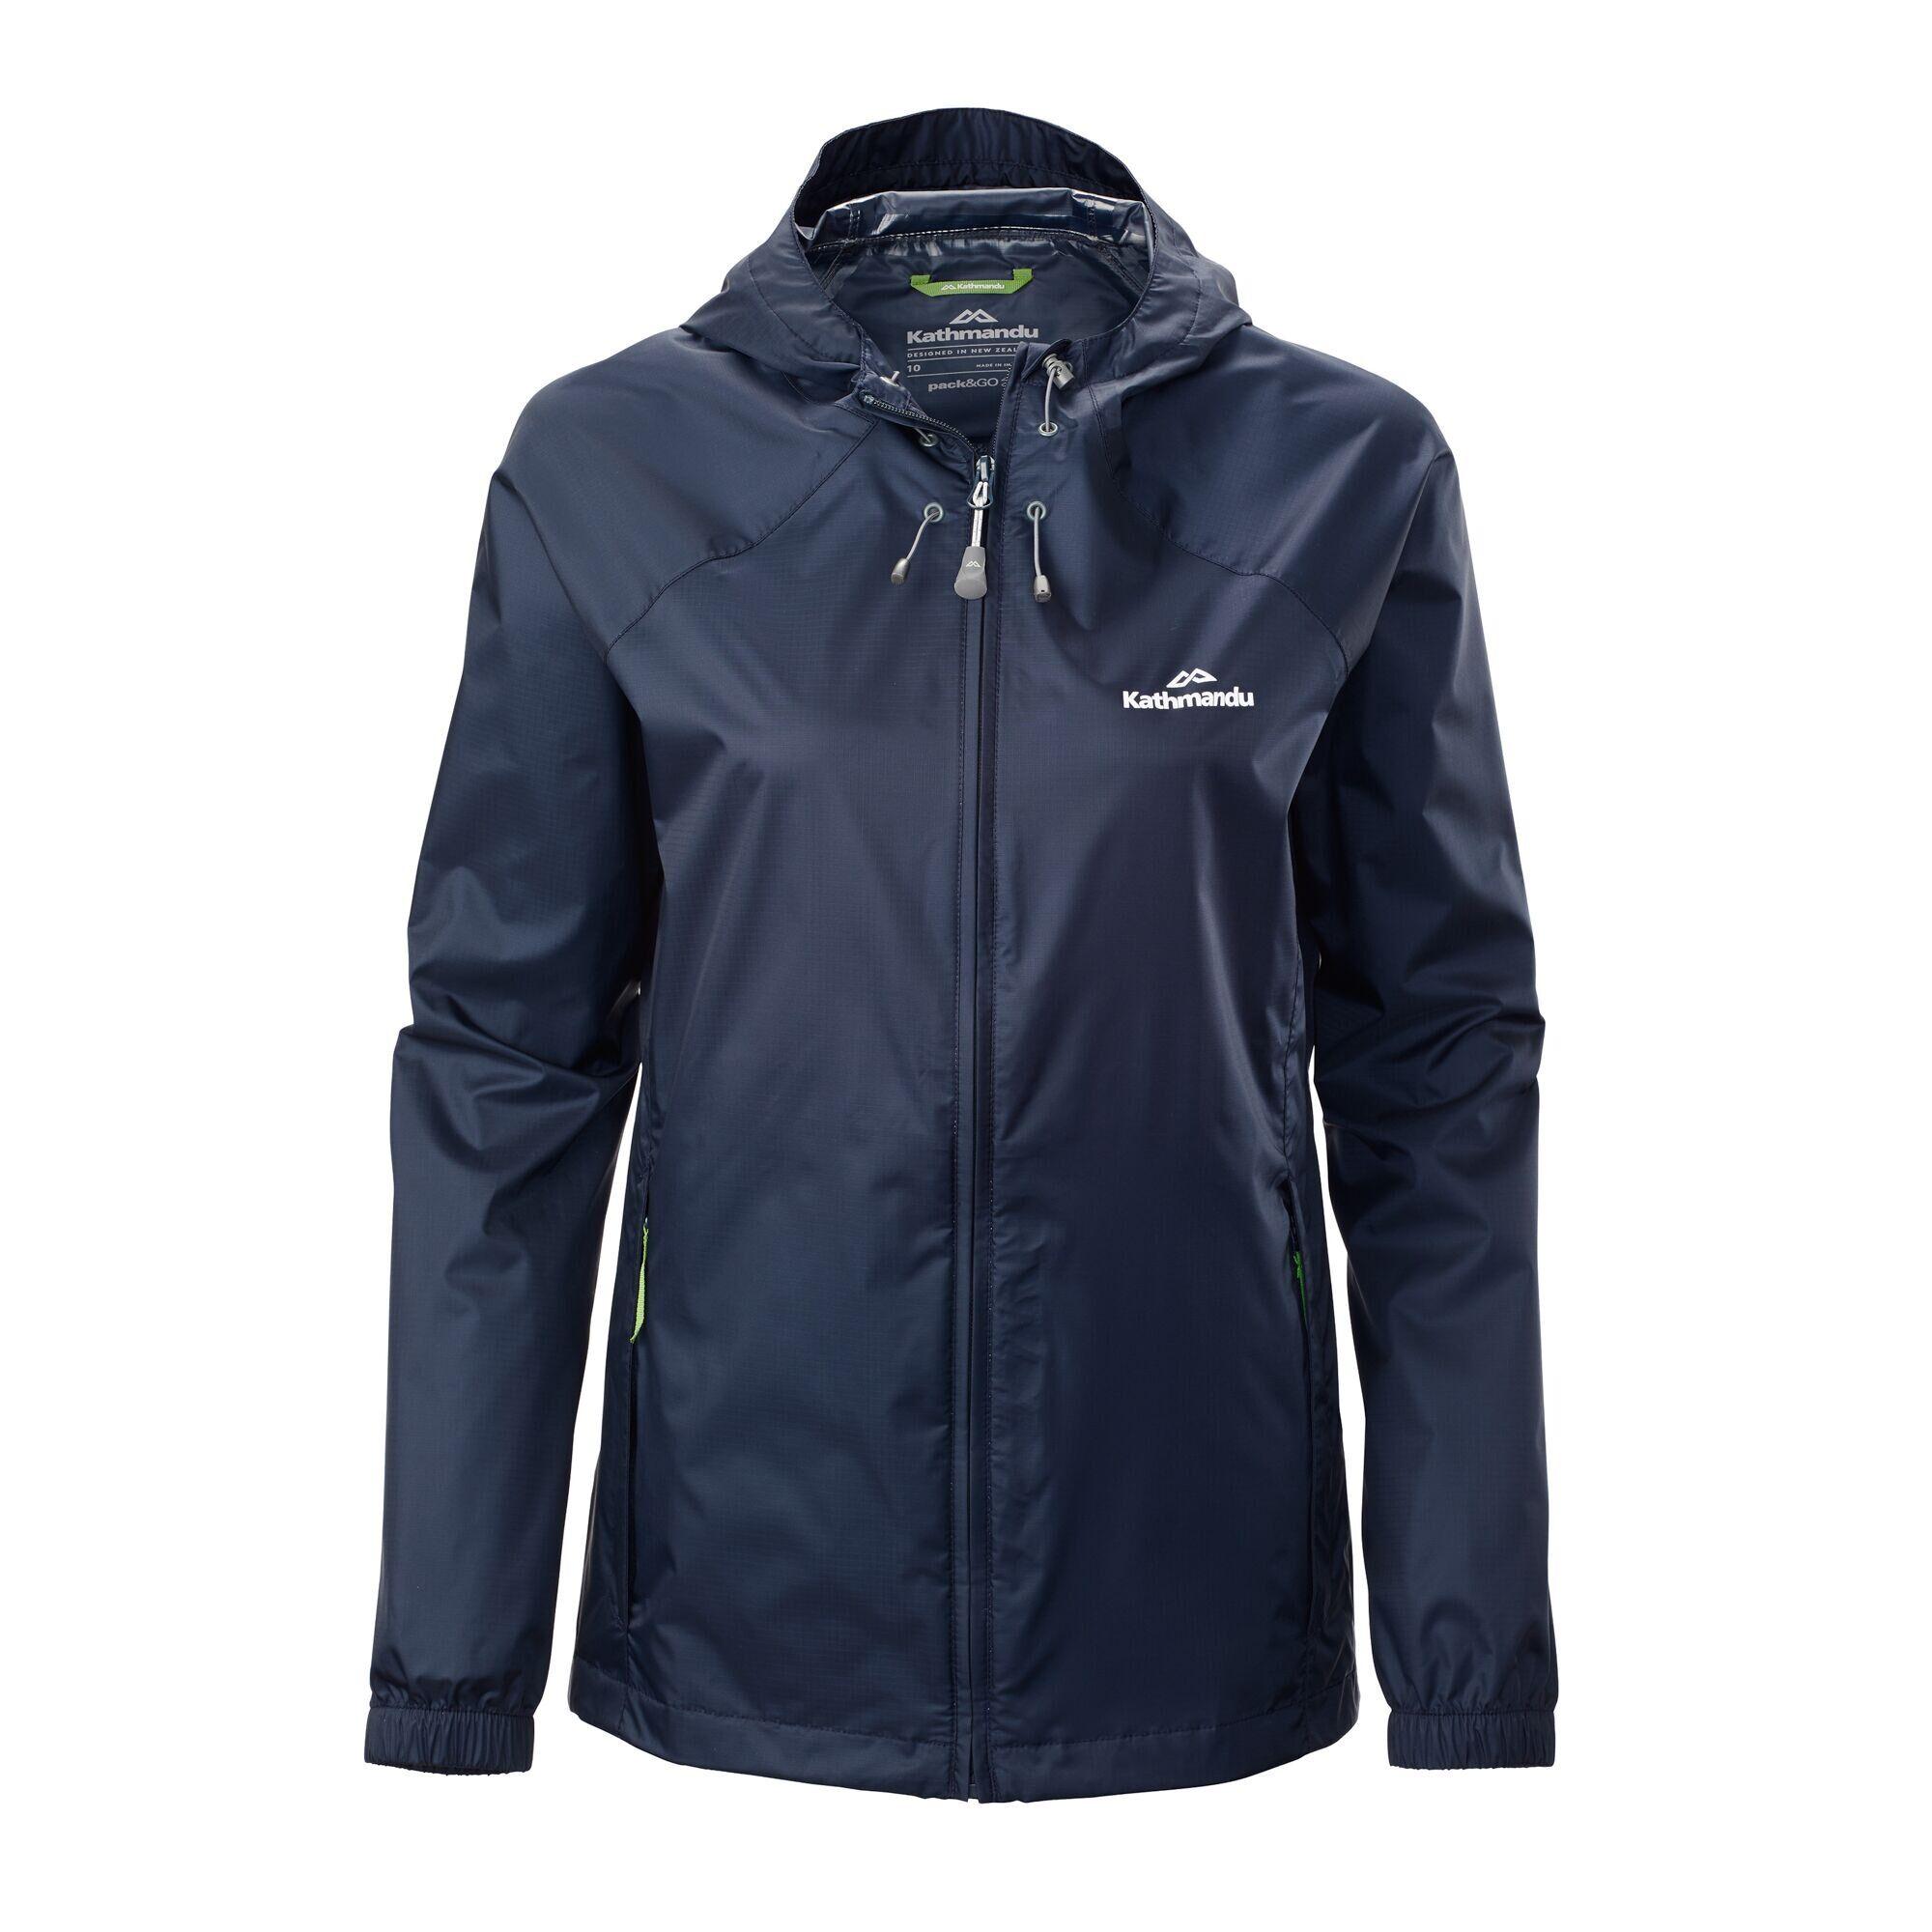 Kathmandu Pocket-it Women's Rain Jacket  - Midnight Navy - Size: US 8